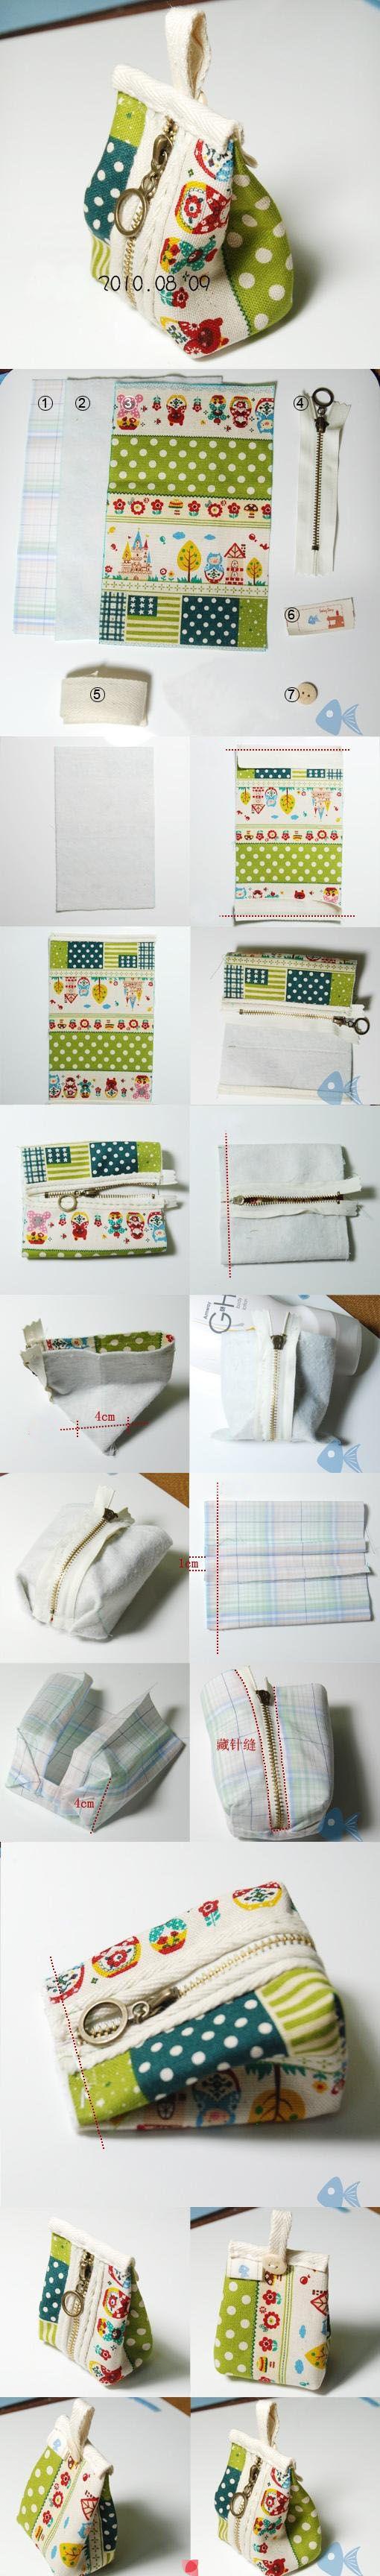 How to Make Stylish Fabric Handmade bags | Cartuchera, Bolsos y ...